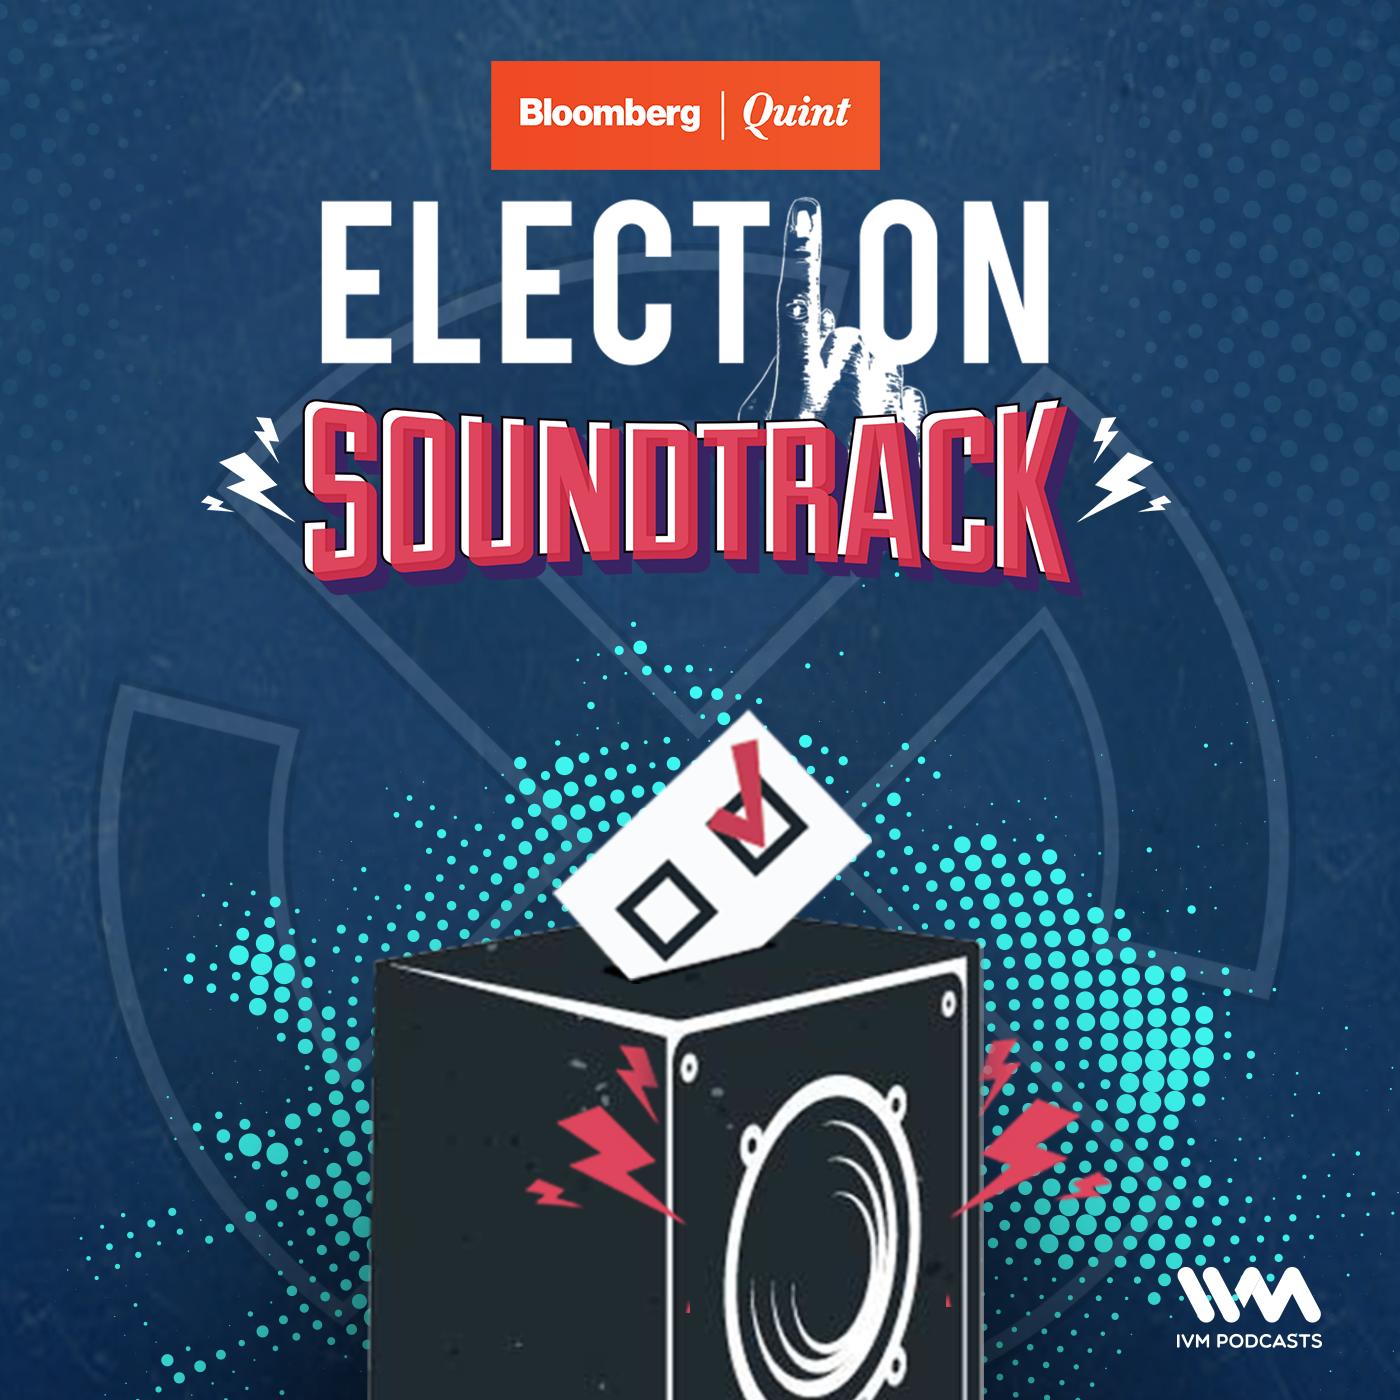 Election Soundtrack |